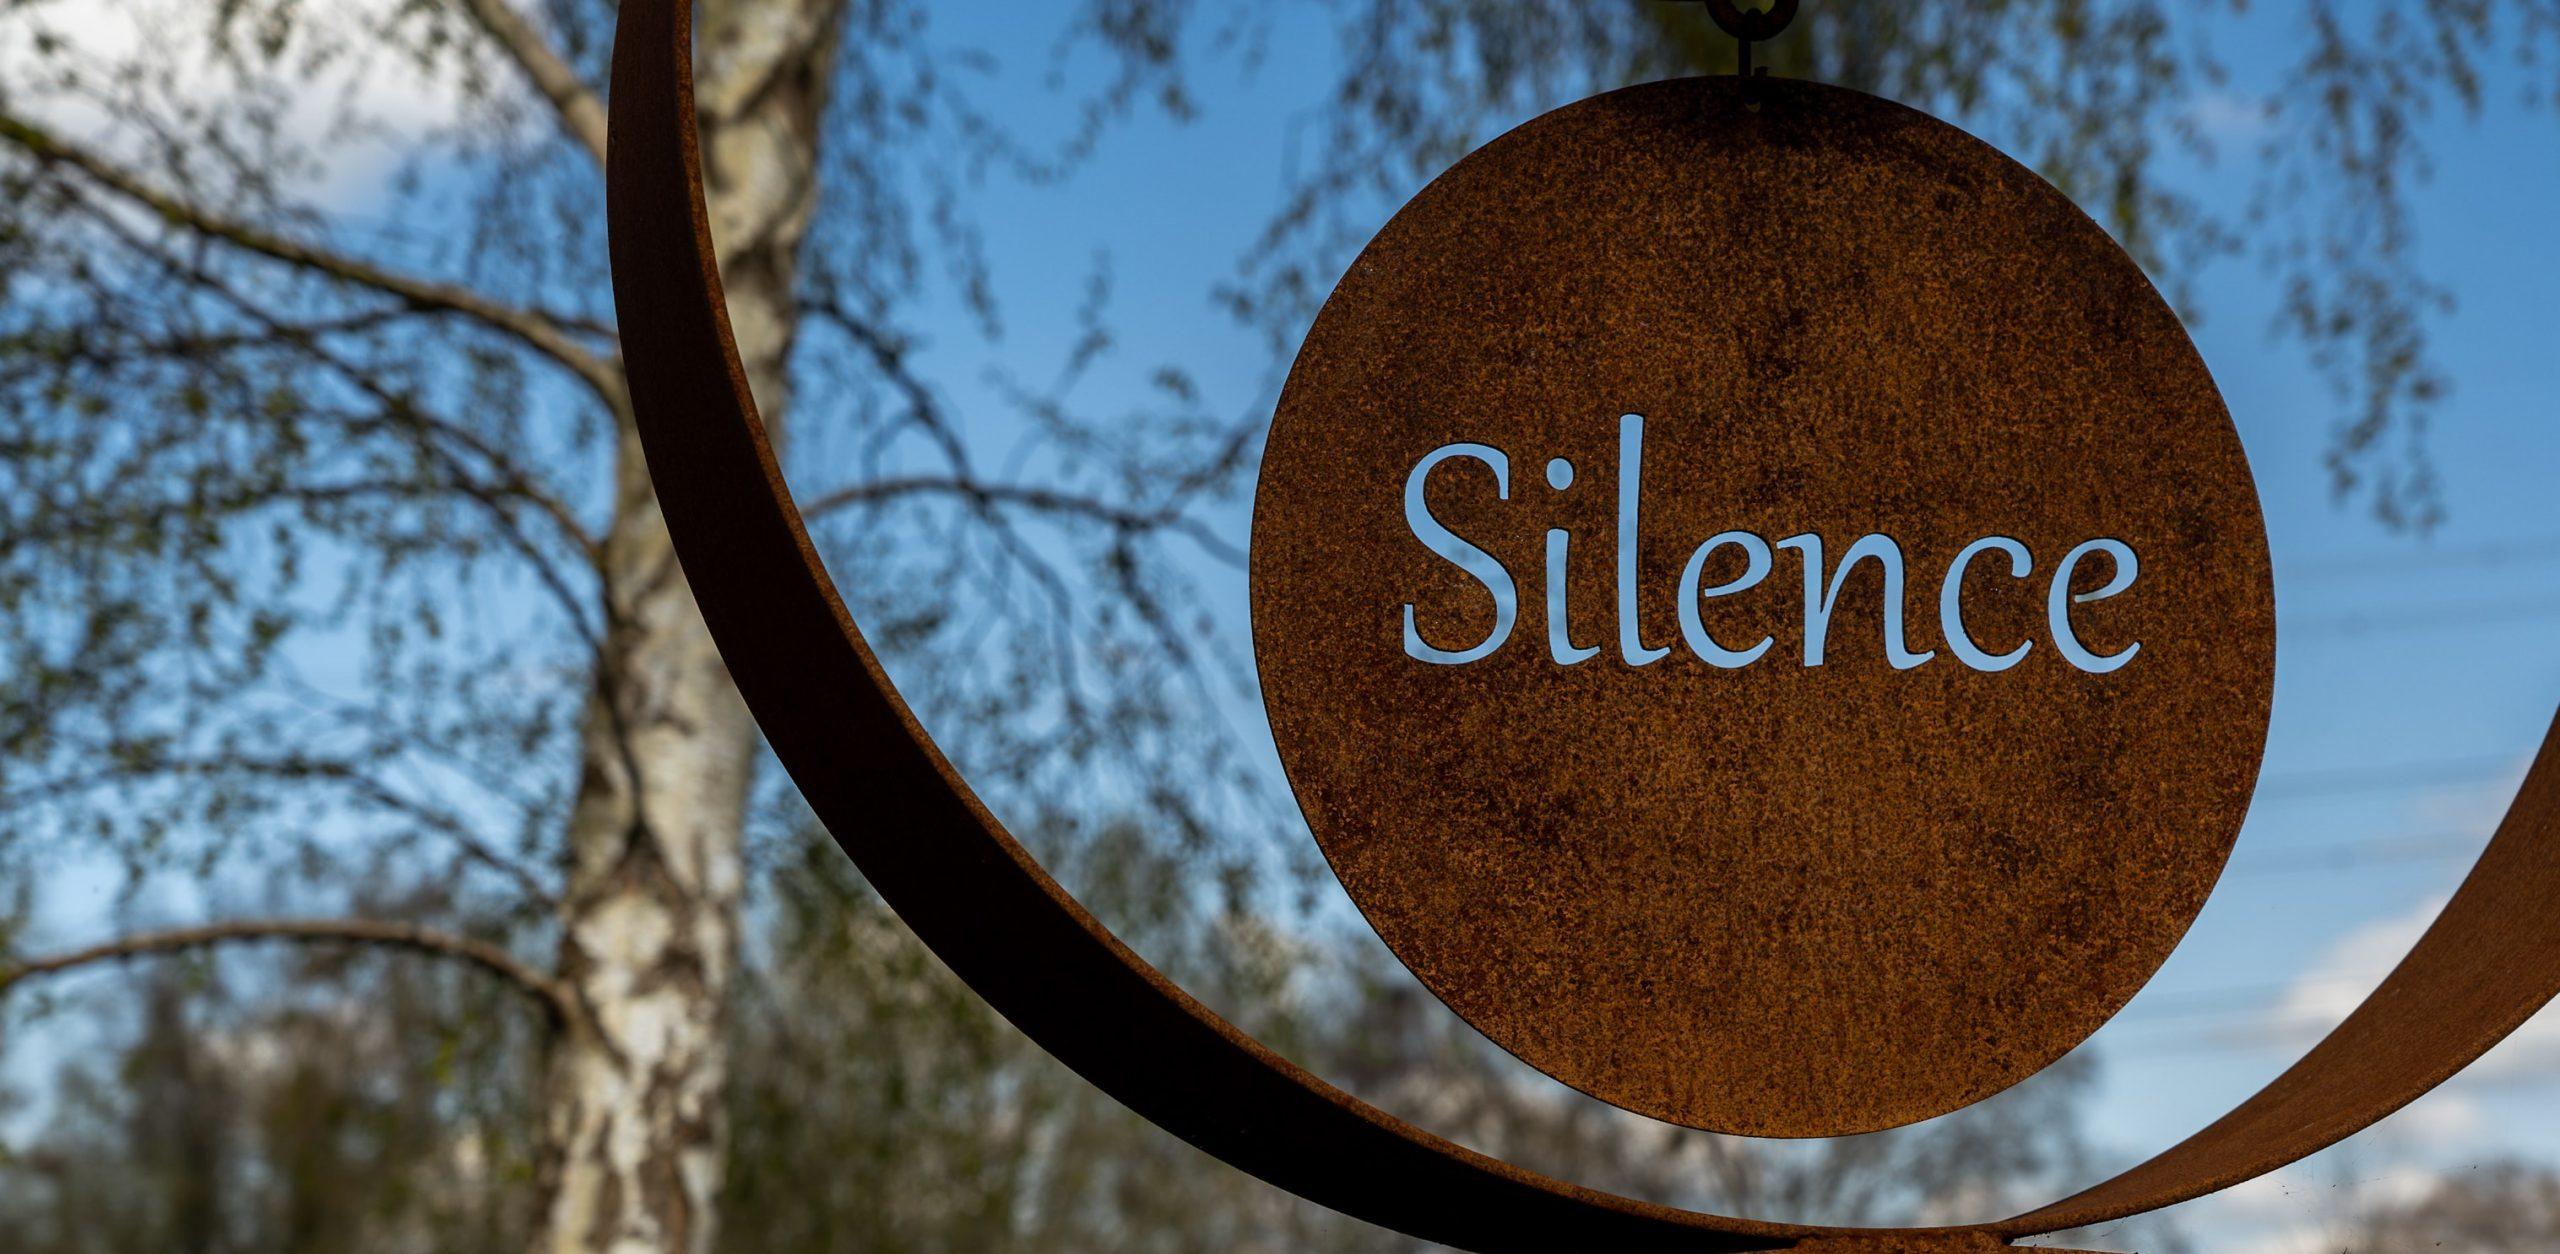 silence-deepen-image